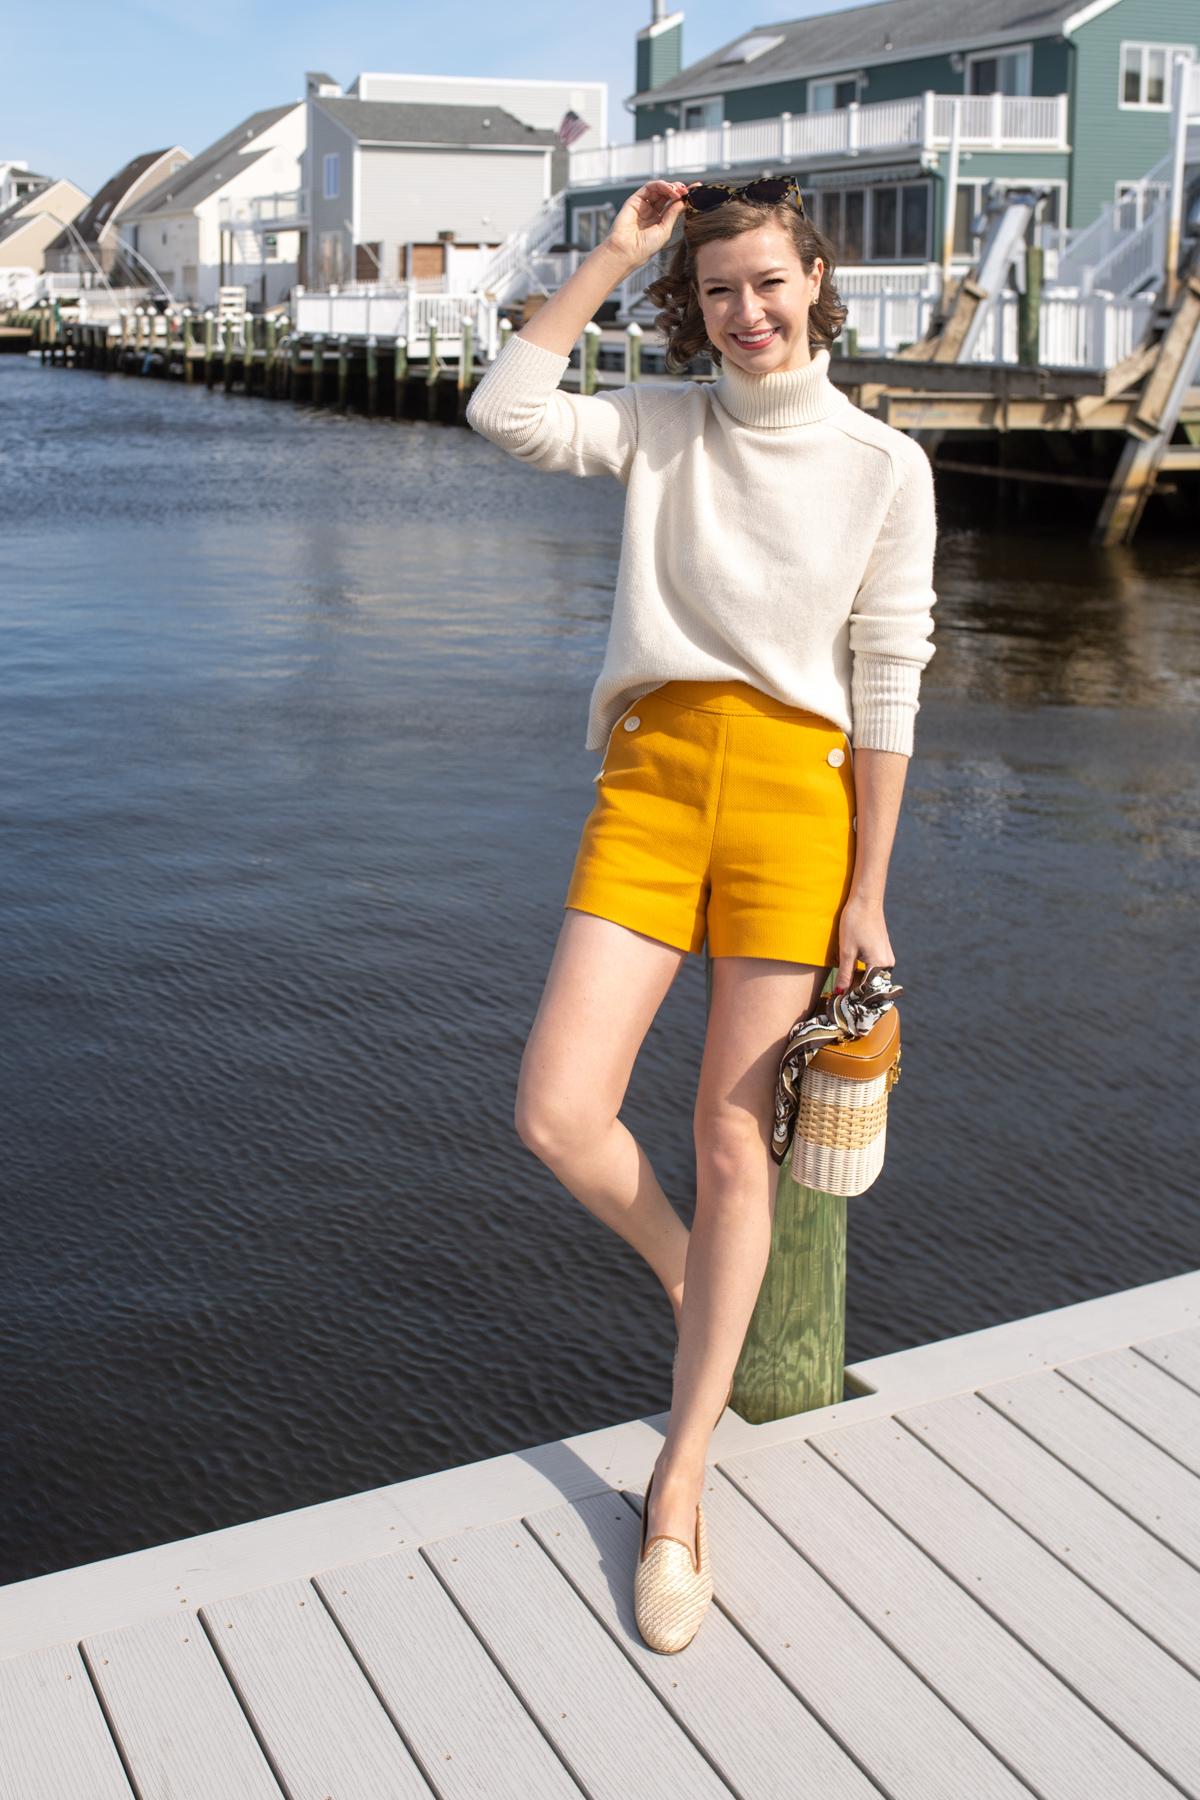 Stacie Flinner X J.Crew Sailor Shorts-4.jpg